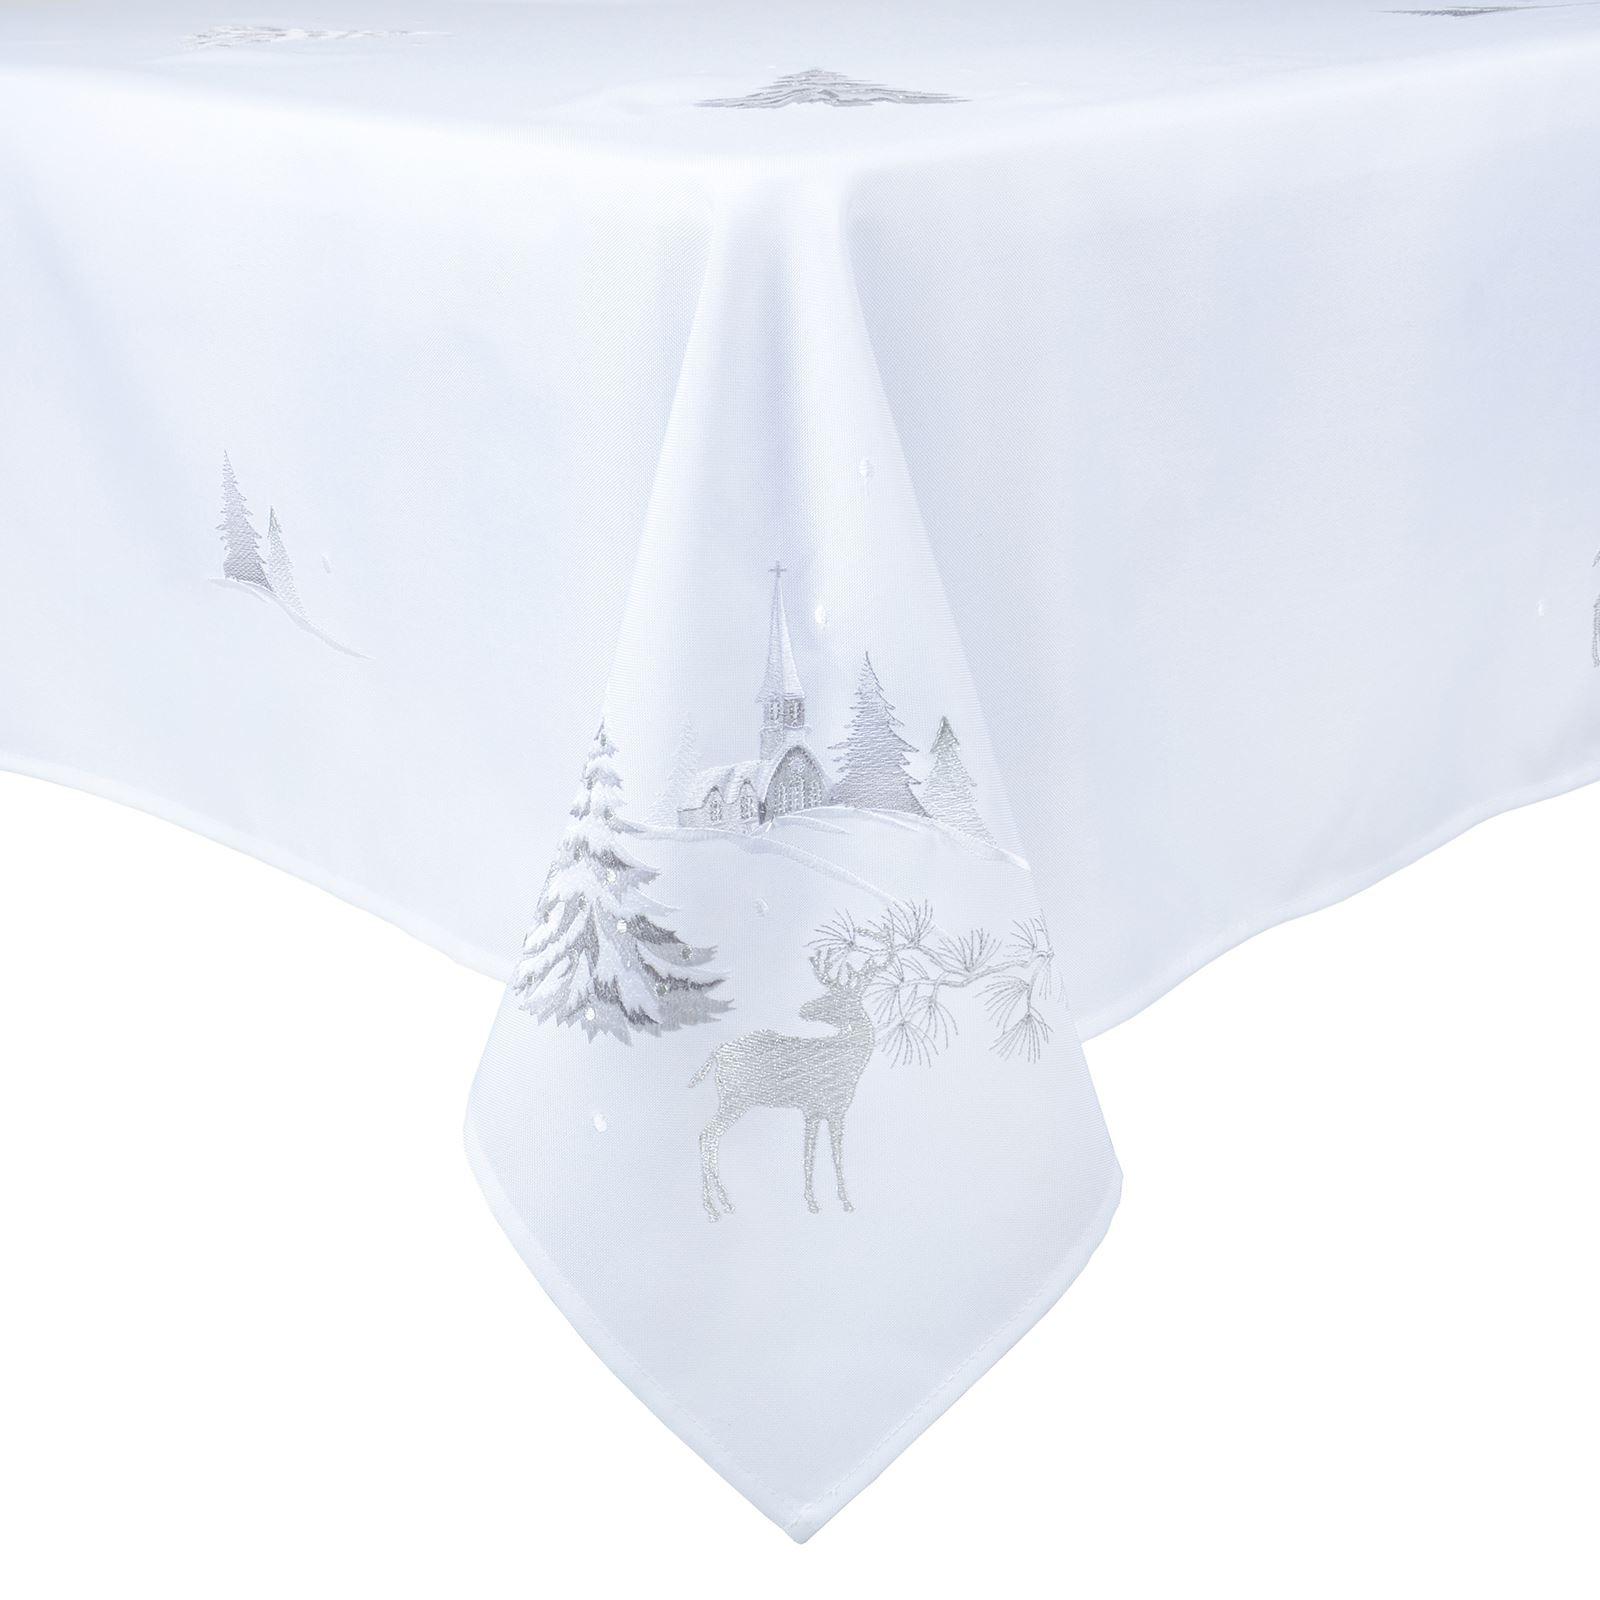 Christmas-Tablecloth-Festive-Pattern-Rectangle-Round-Fabric-Xmas-Room-Decoration Indexbild 55